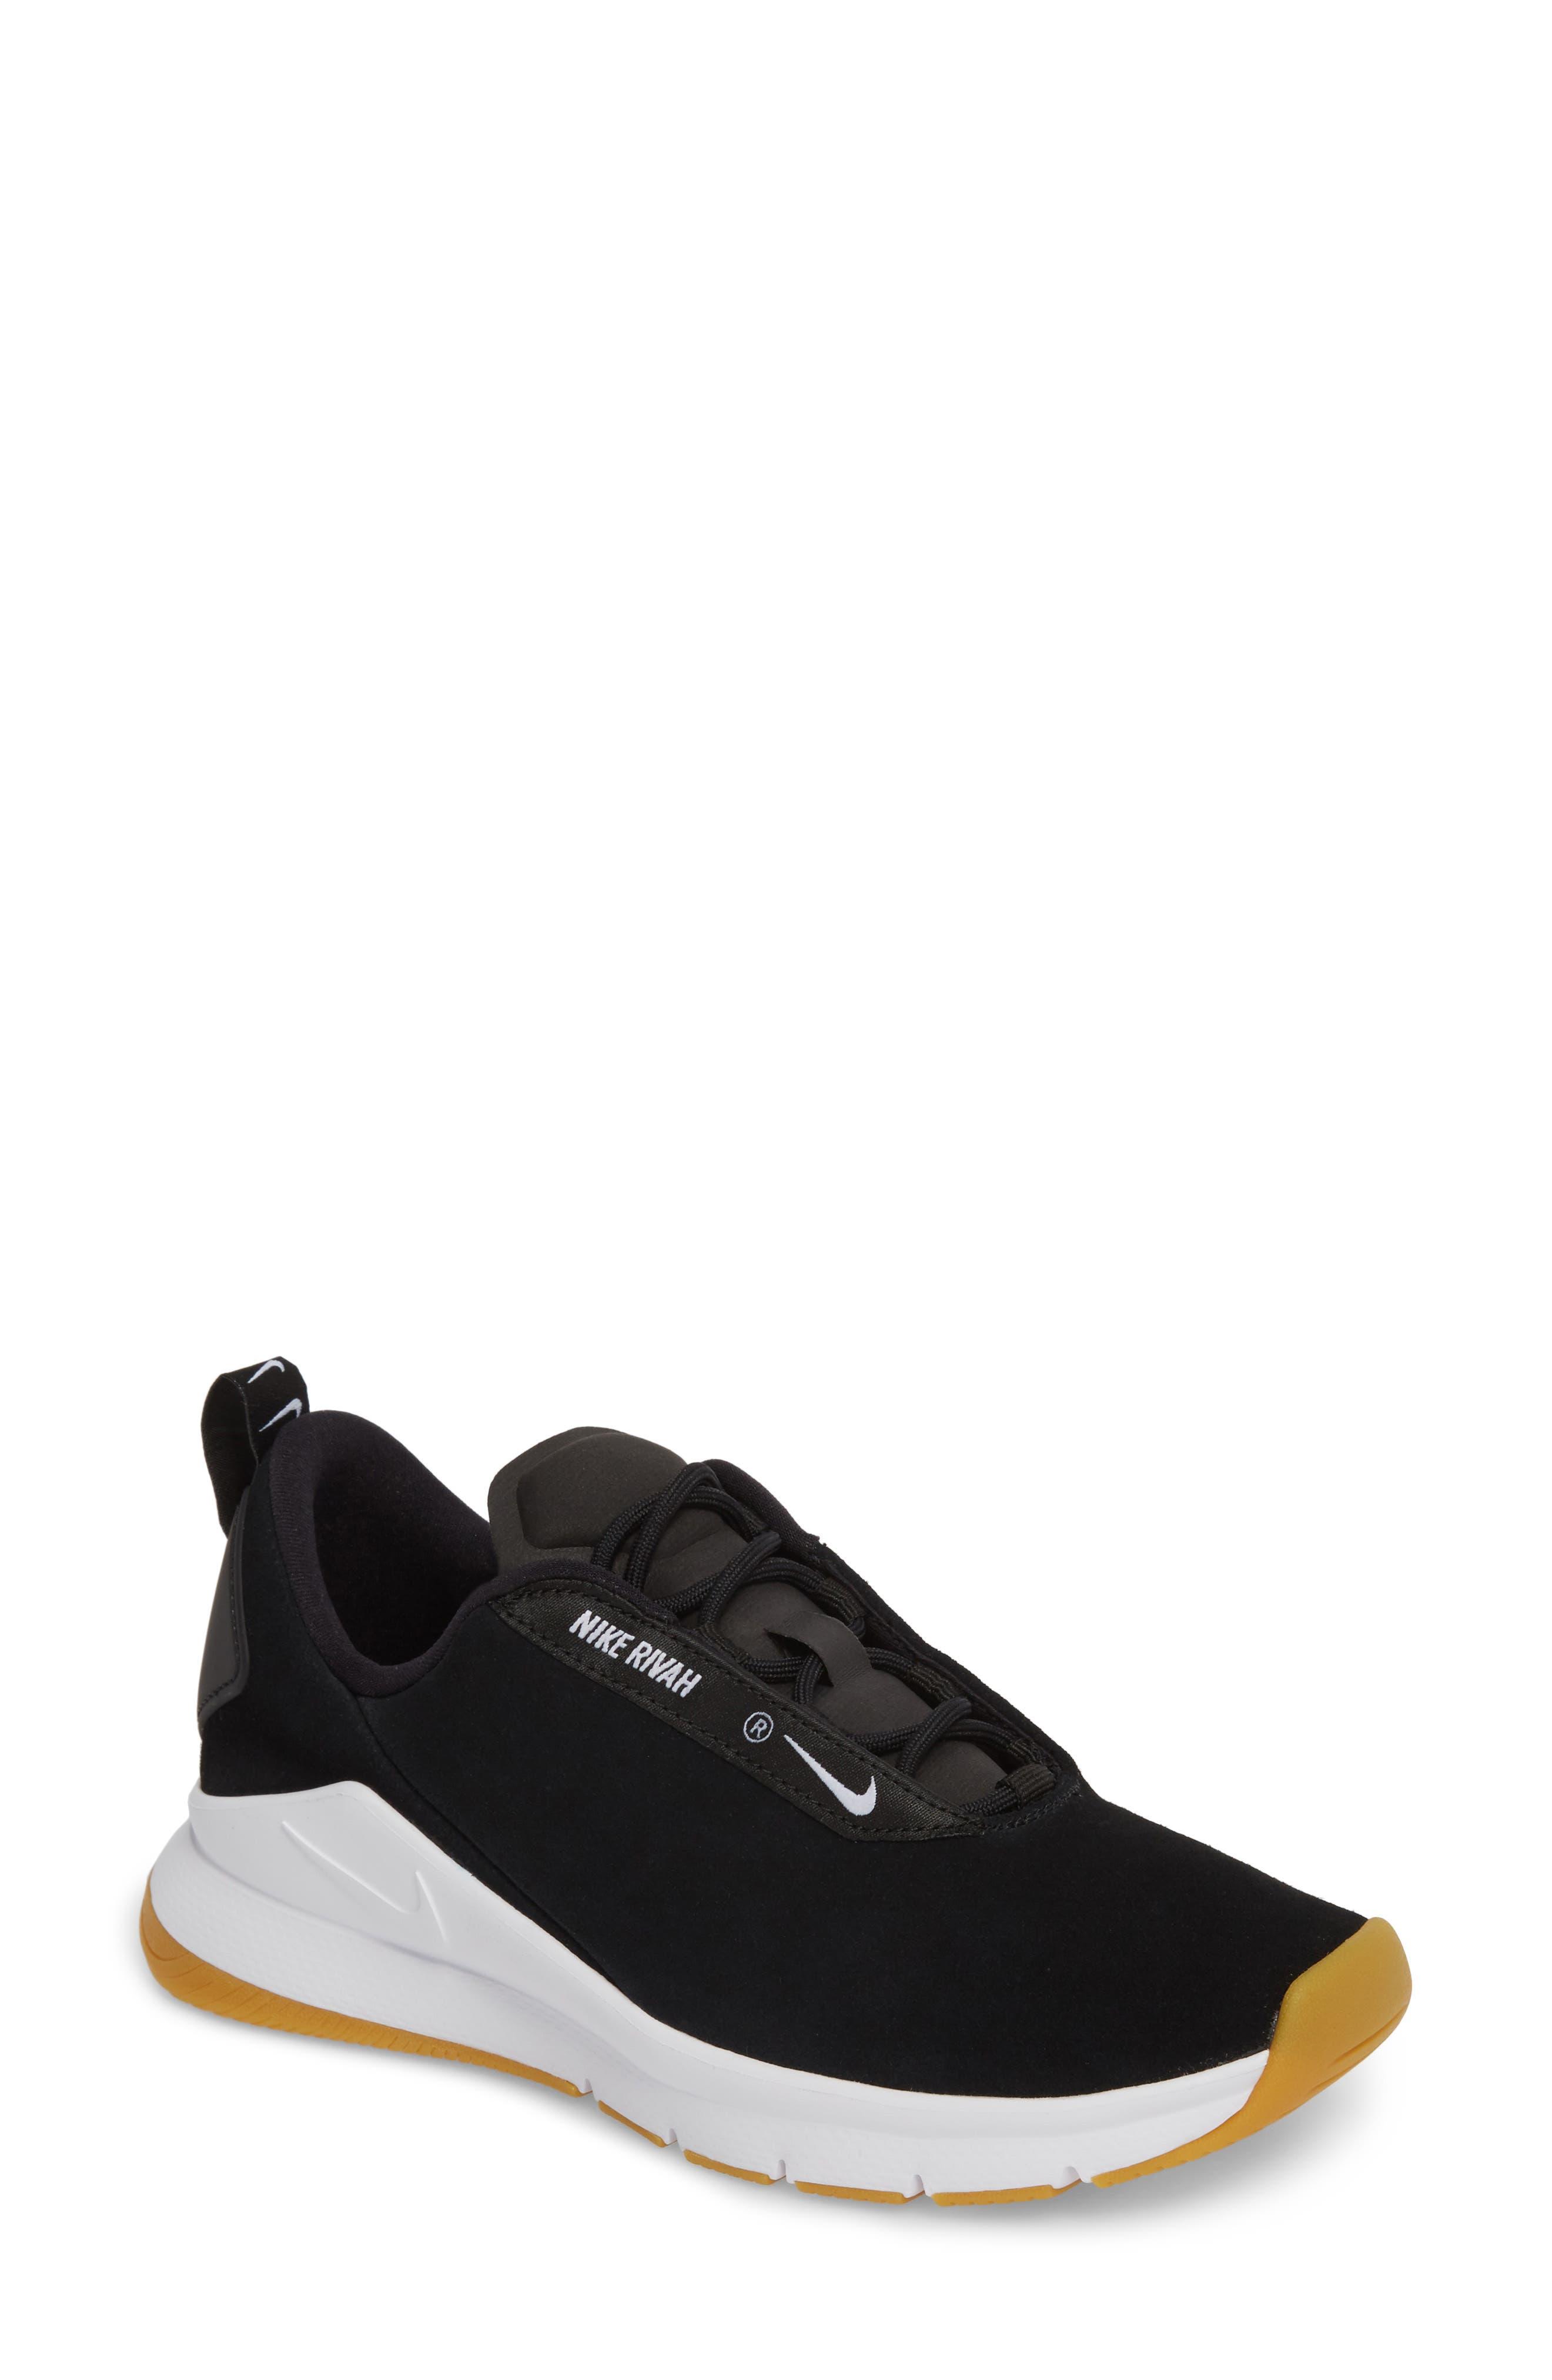 Designers Nike Rivah Black/White For Women